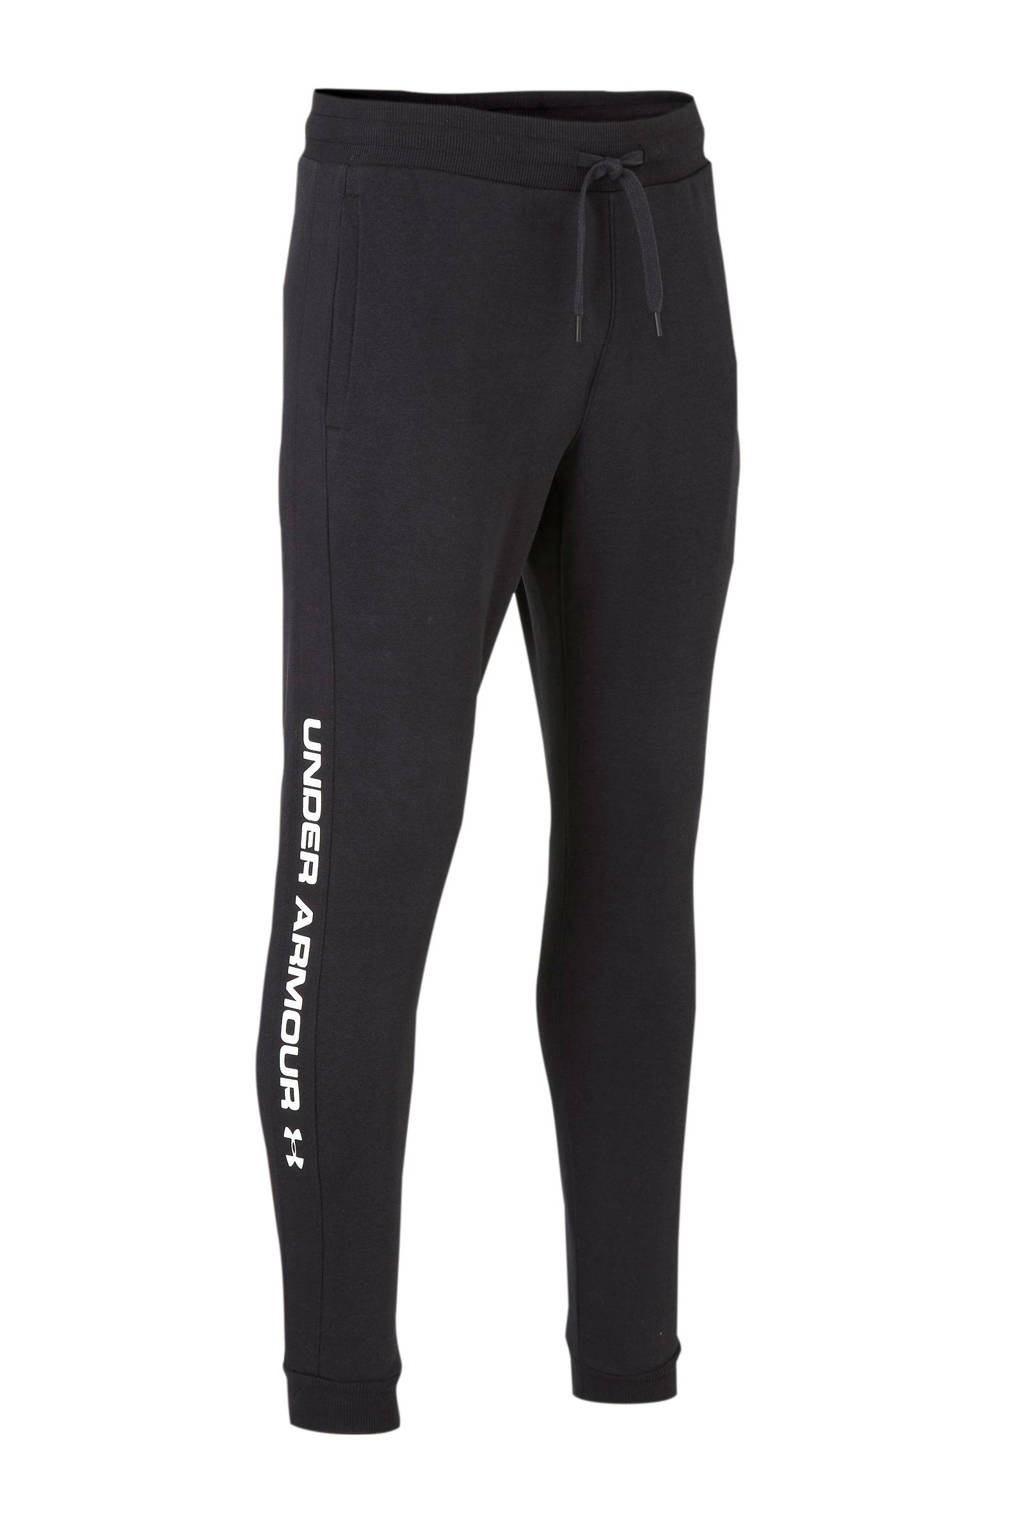 Under Armour joggingbroek zwart, Zwart